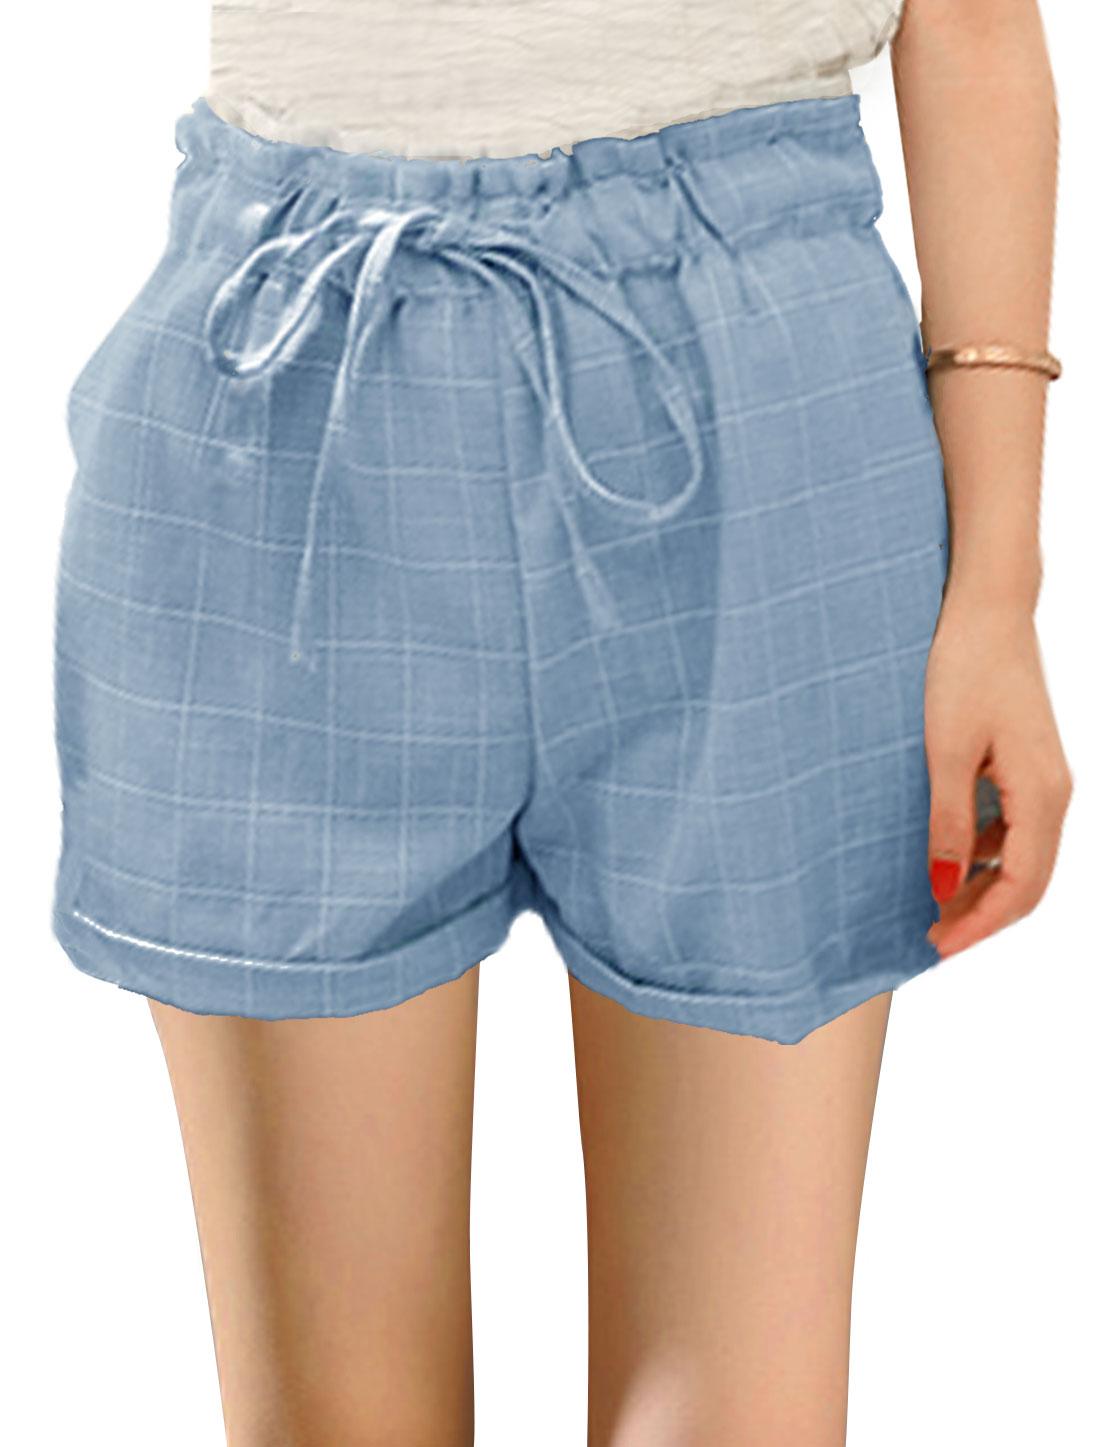 Ladies Checks Drawstring Waist Cuffed Casual Shorts Light Blue XS